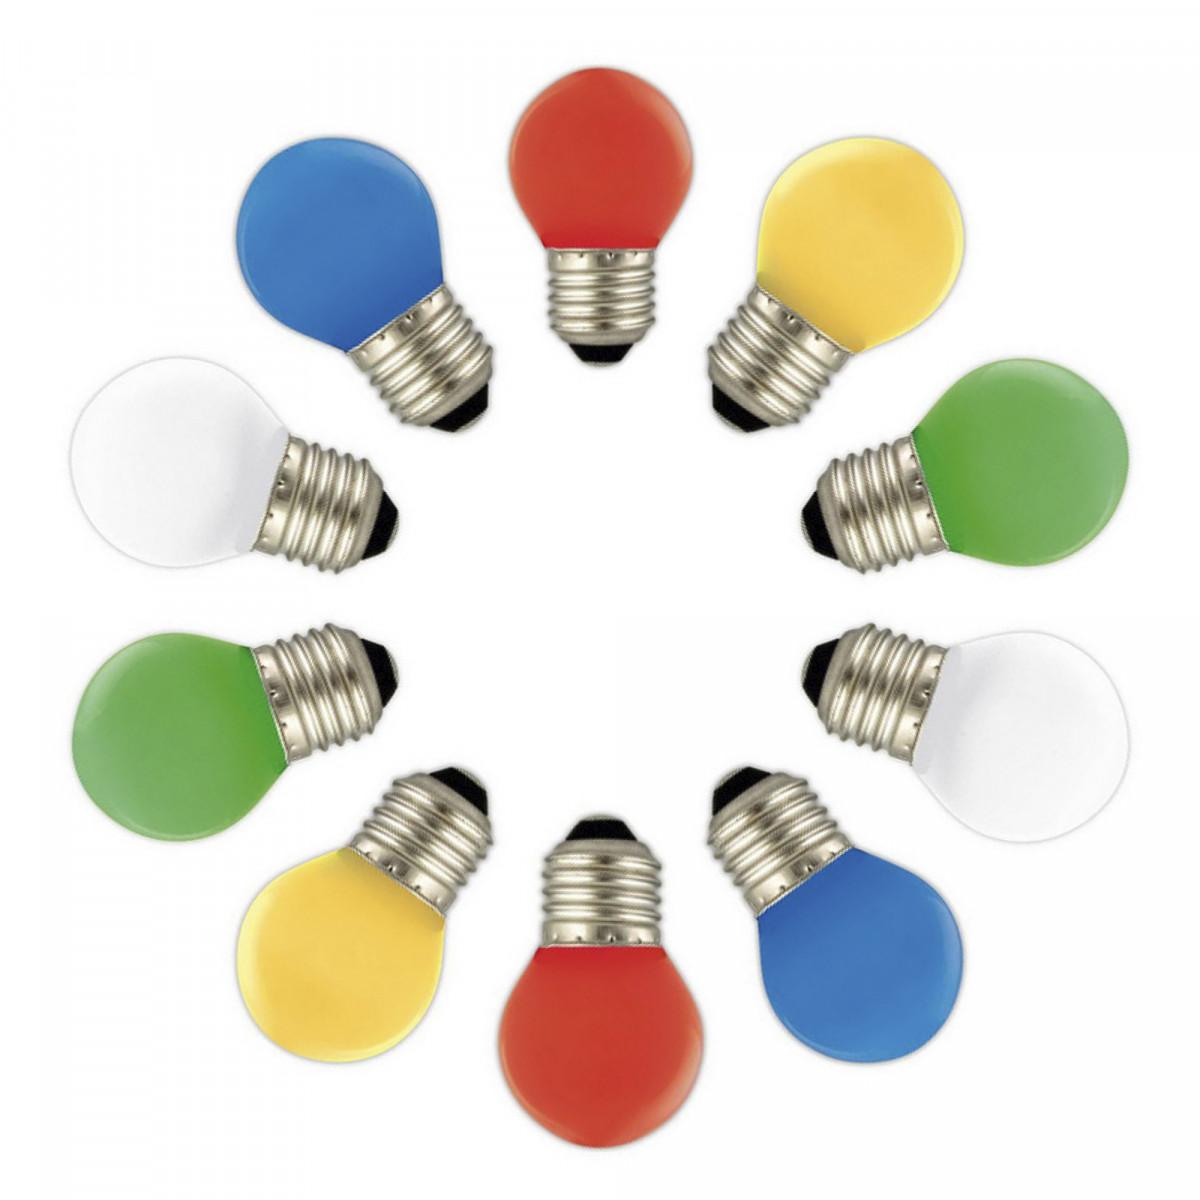 Feestverlichting LED Patio 20 kleur - 20 meter / 24 fittingen